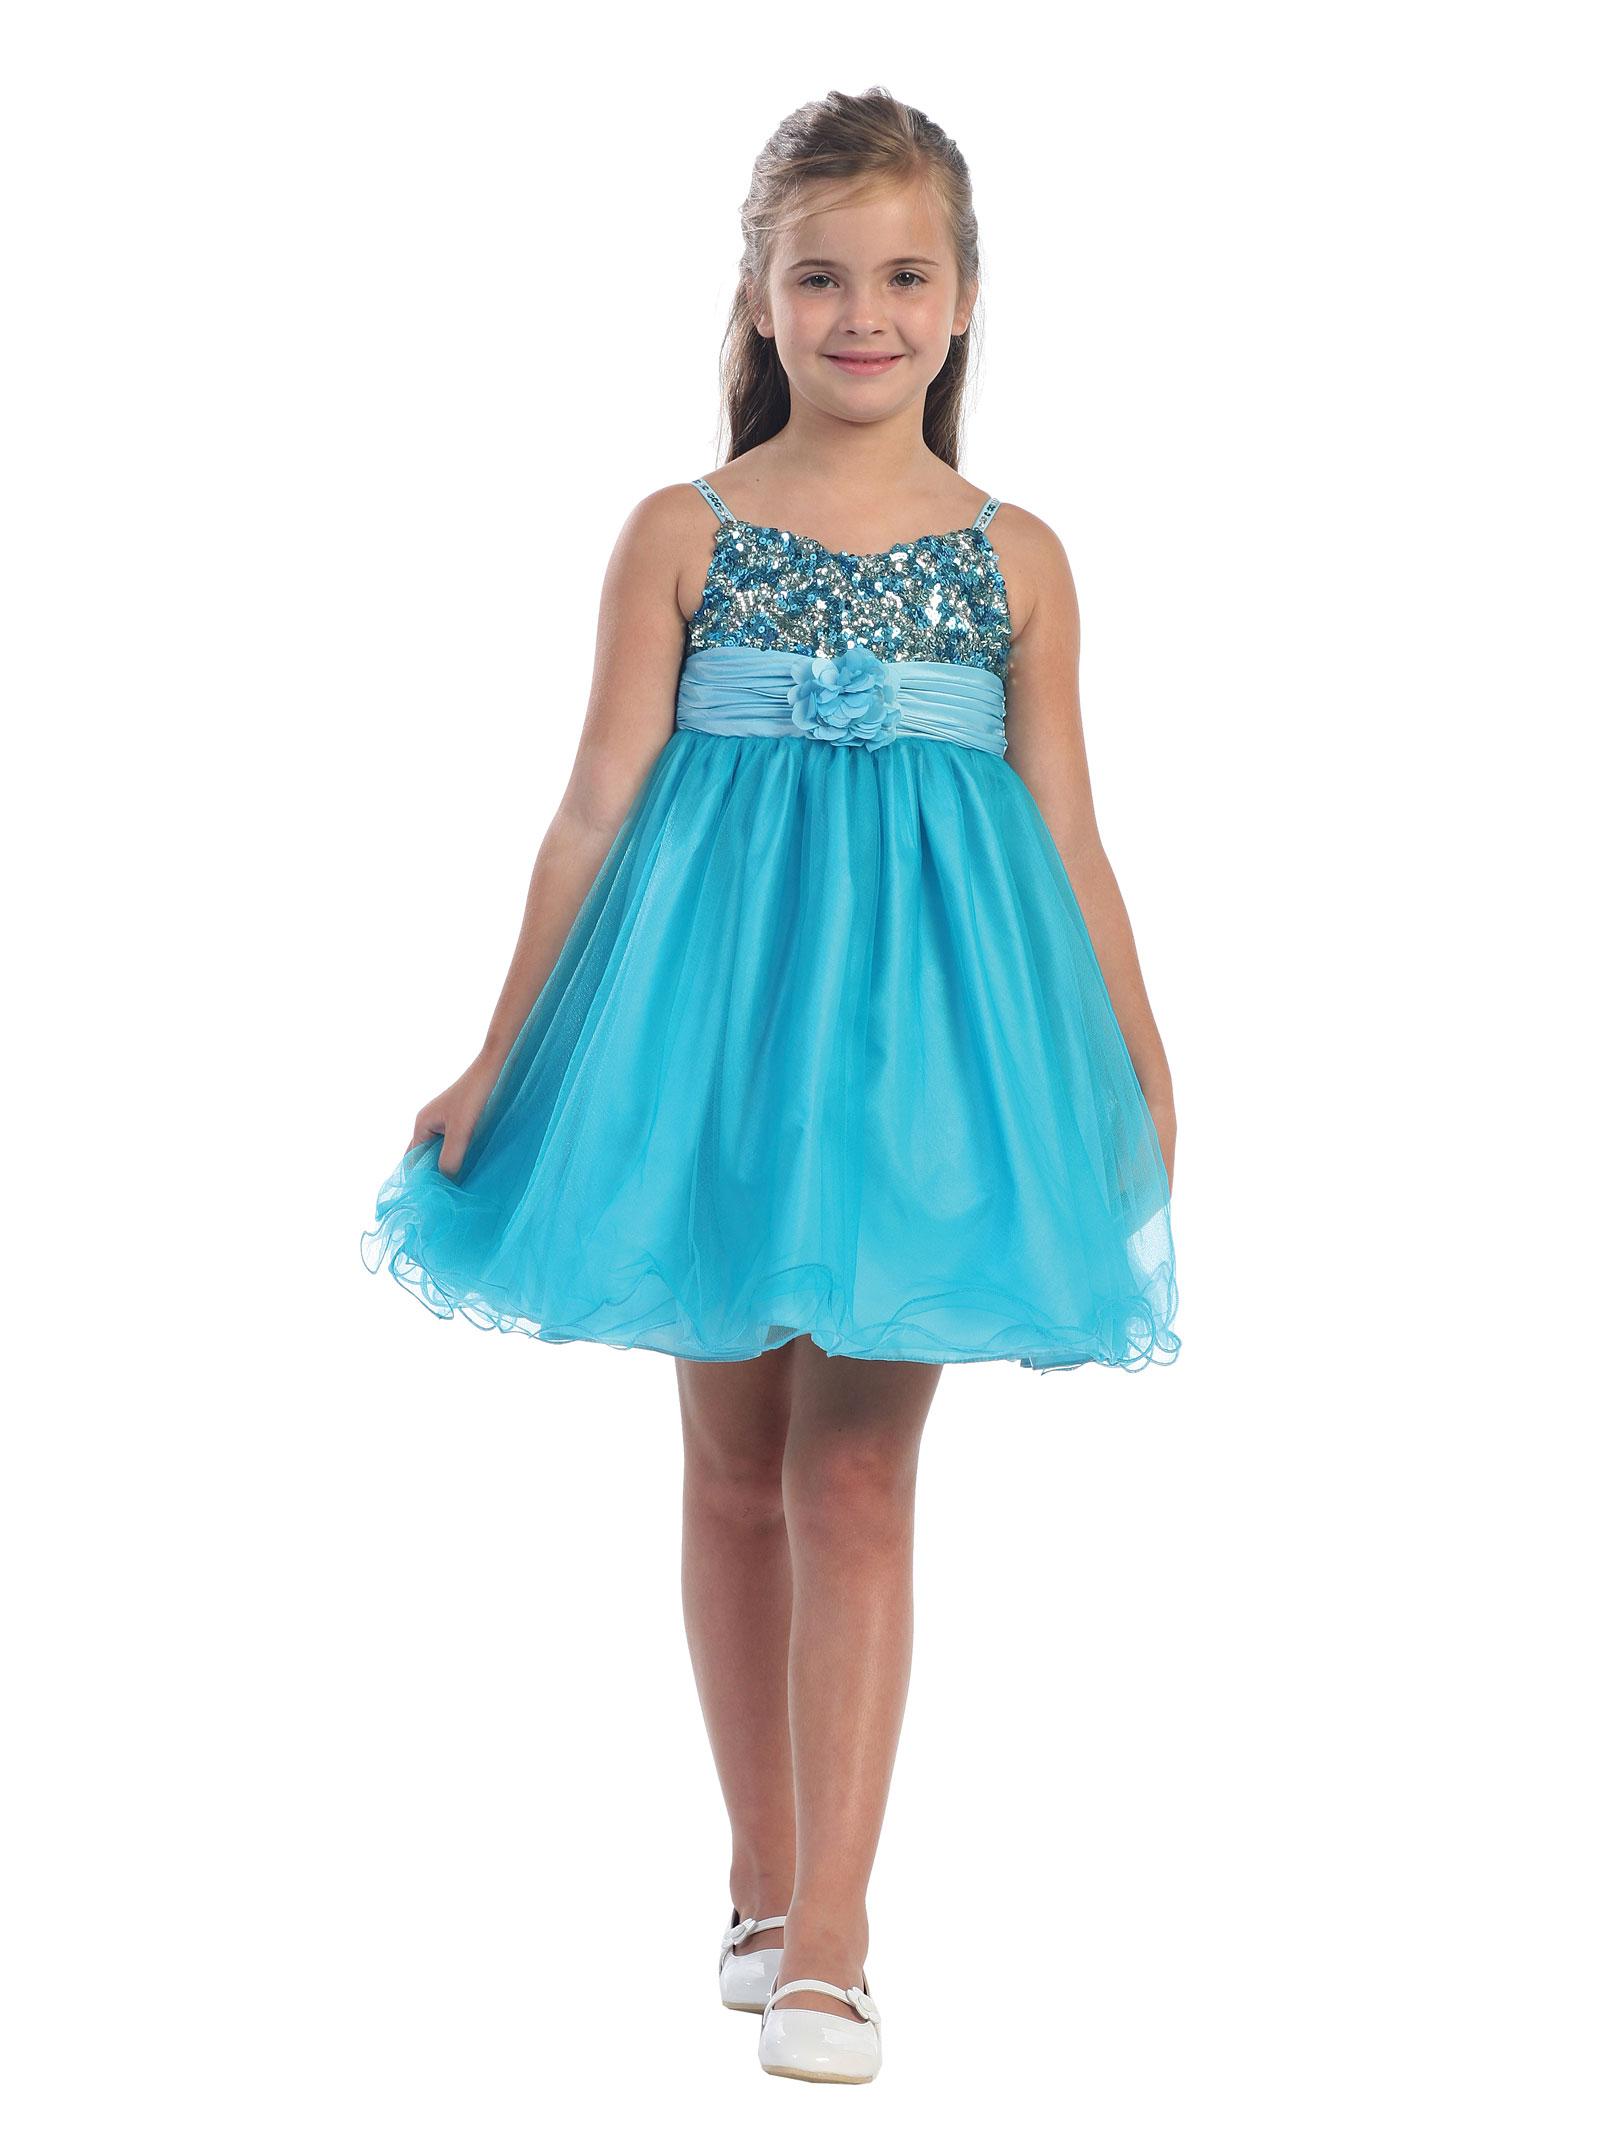 Tween Formal Party Dresses 7-16 – Fashion dresses